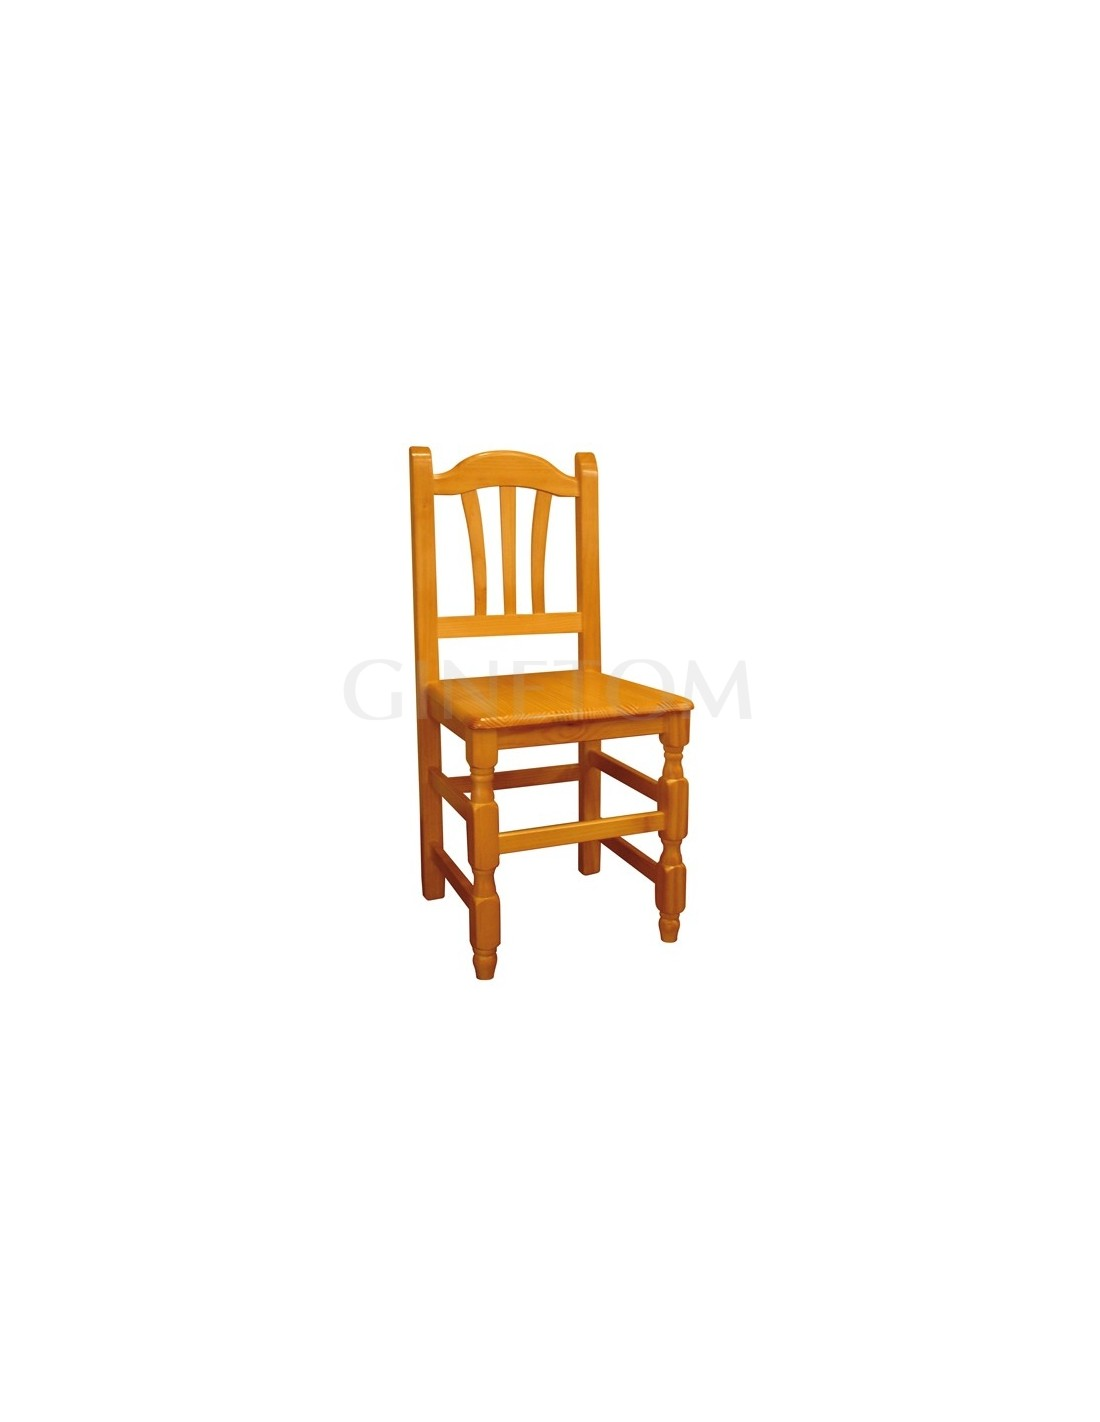 Sillas de madera ref 110 sillas hosteler a de ginetom for Sillas economicas de madera